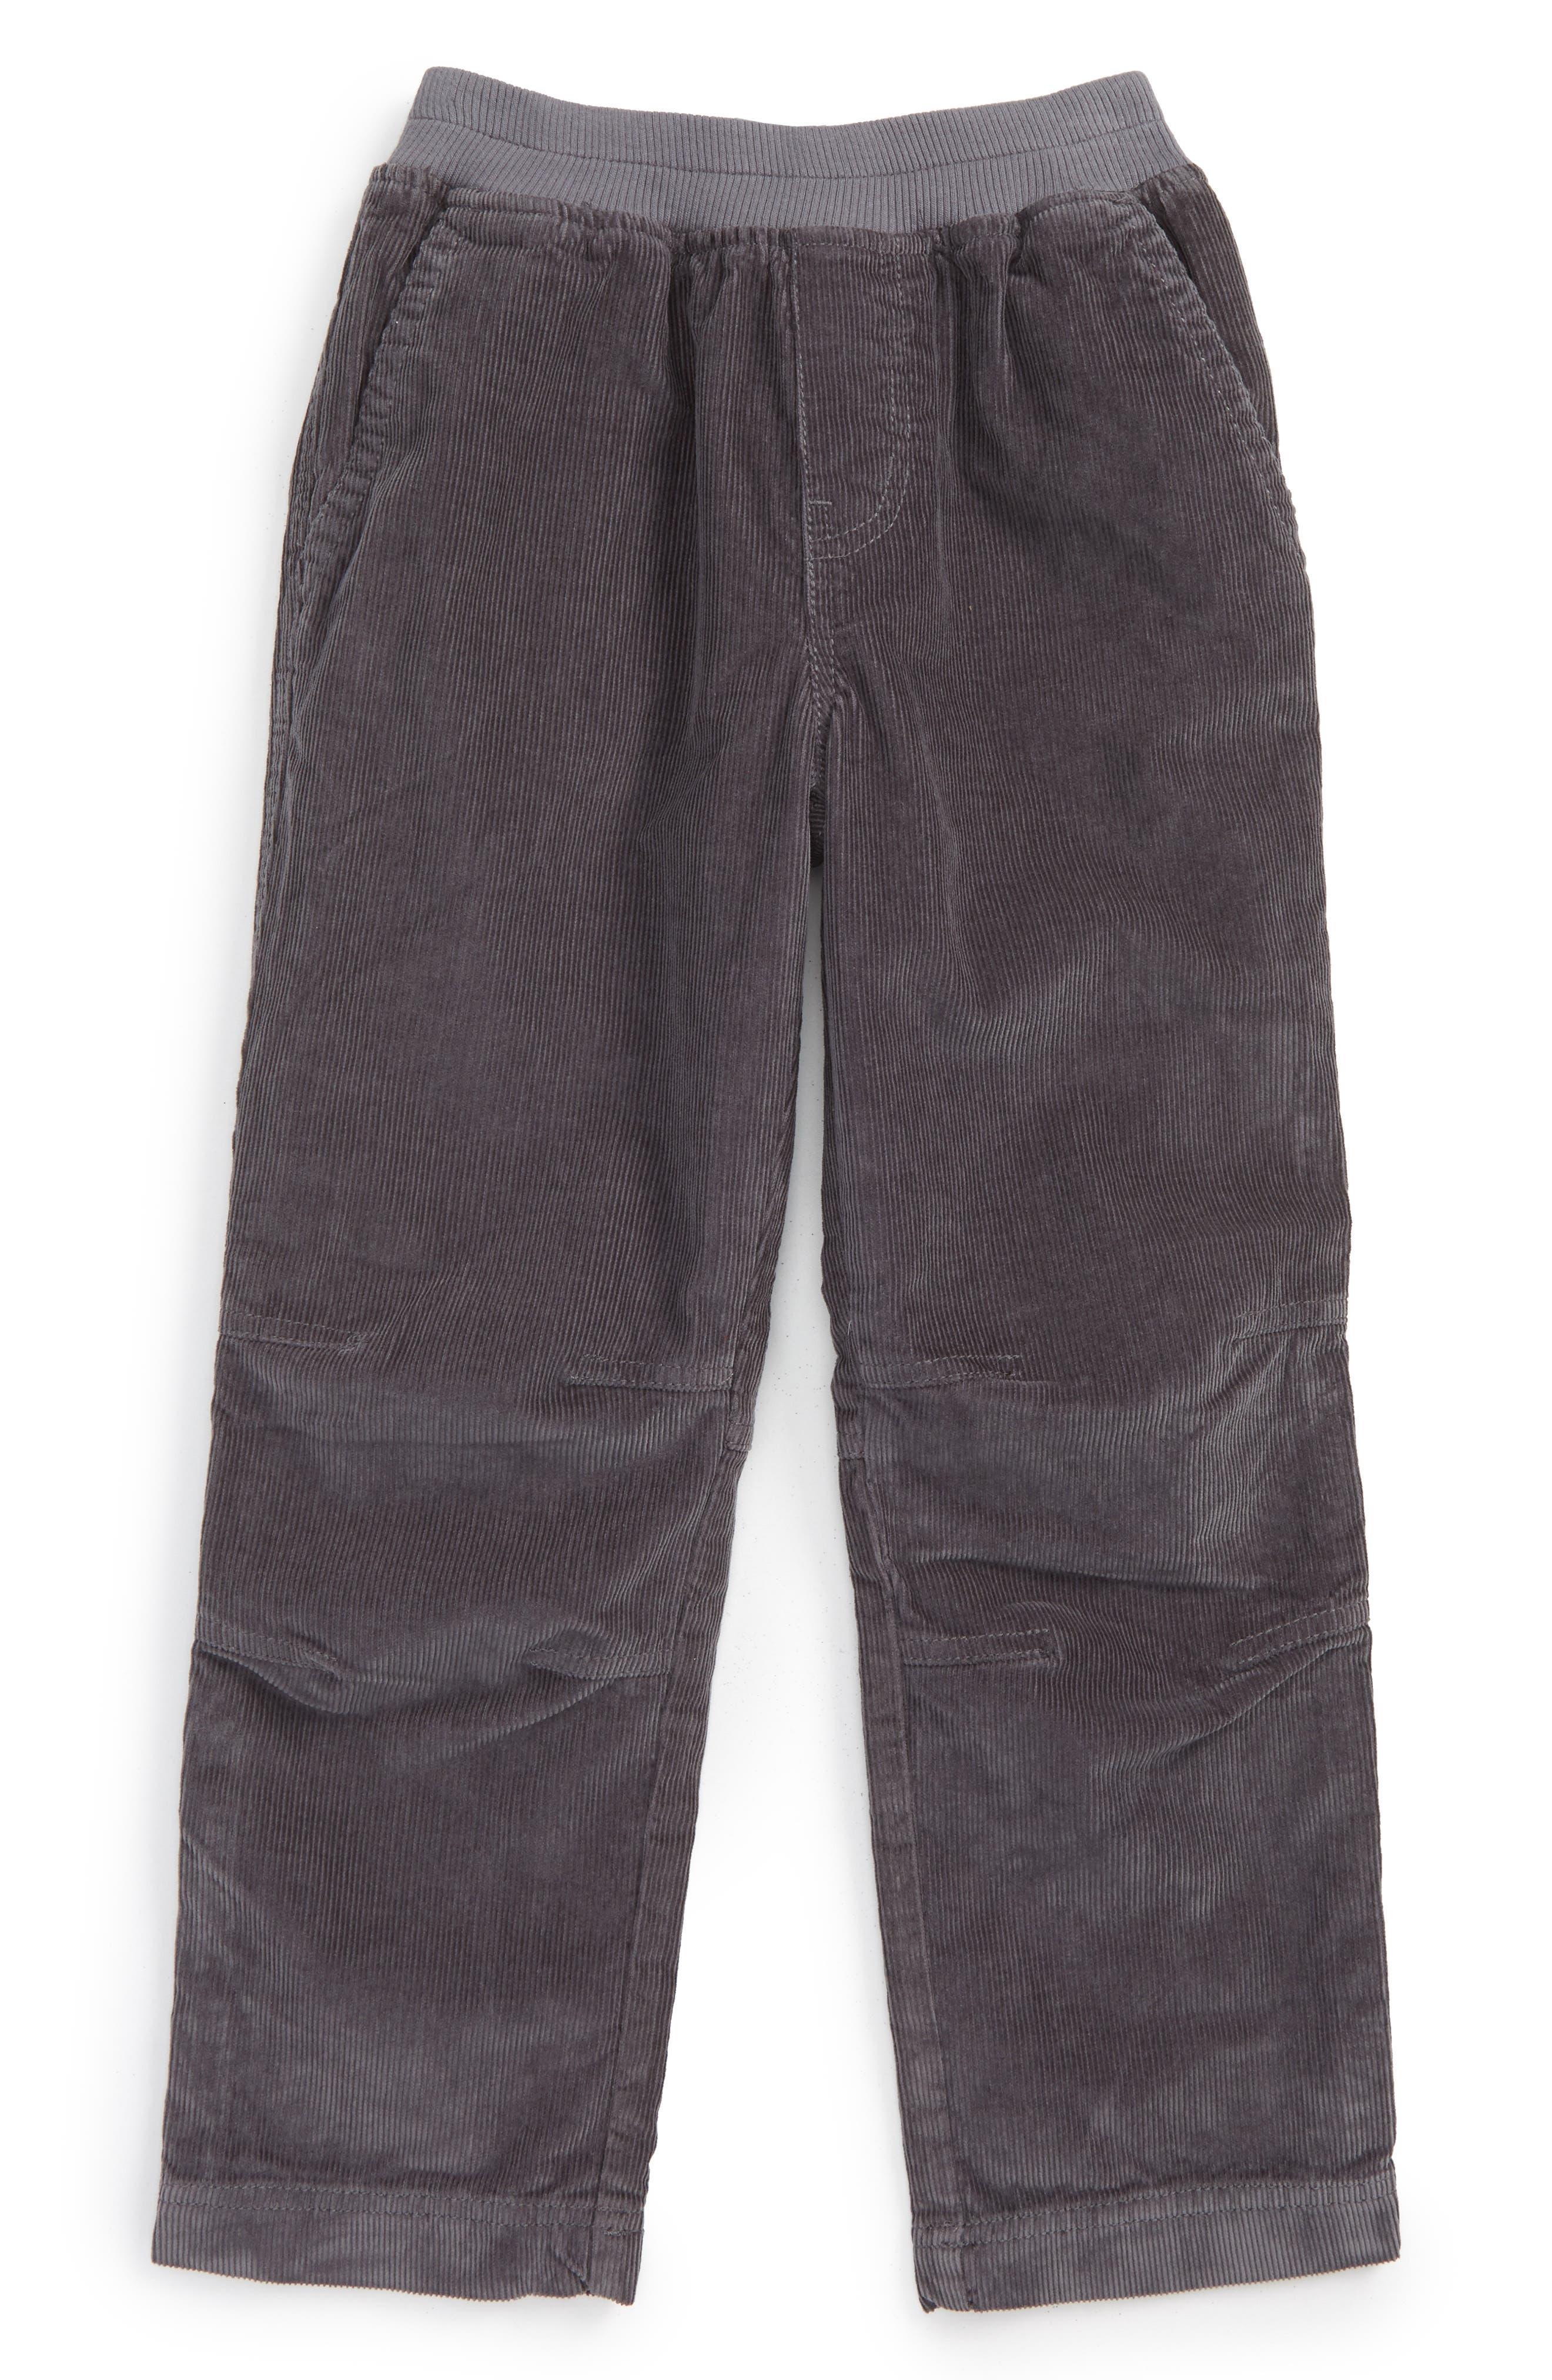 Alternate Image 1 Selected - Tea Collection Corduroy Pants (Toddler Boys & Little Boys)